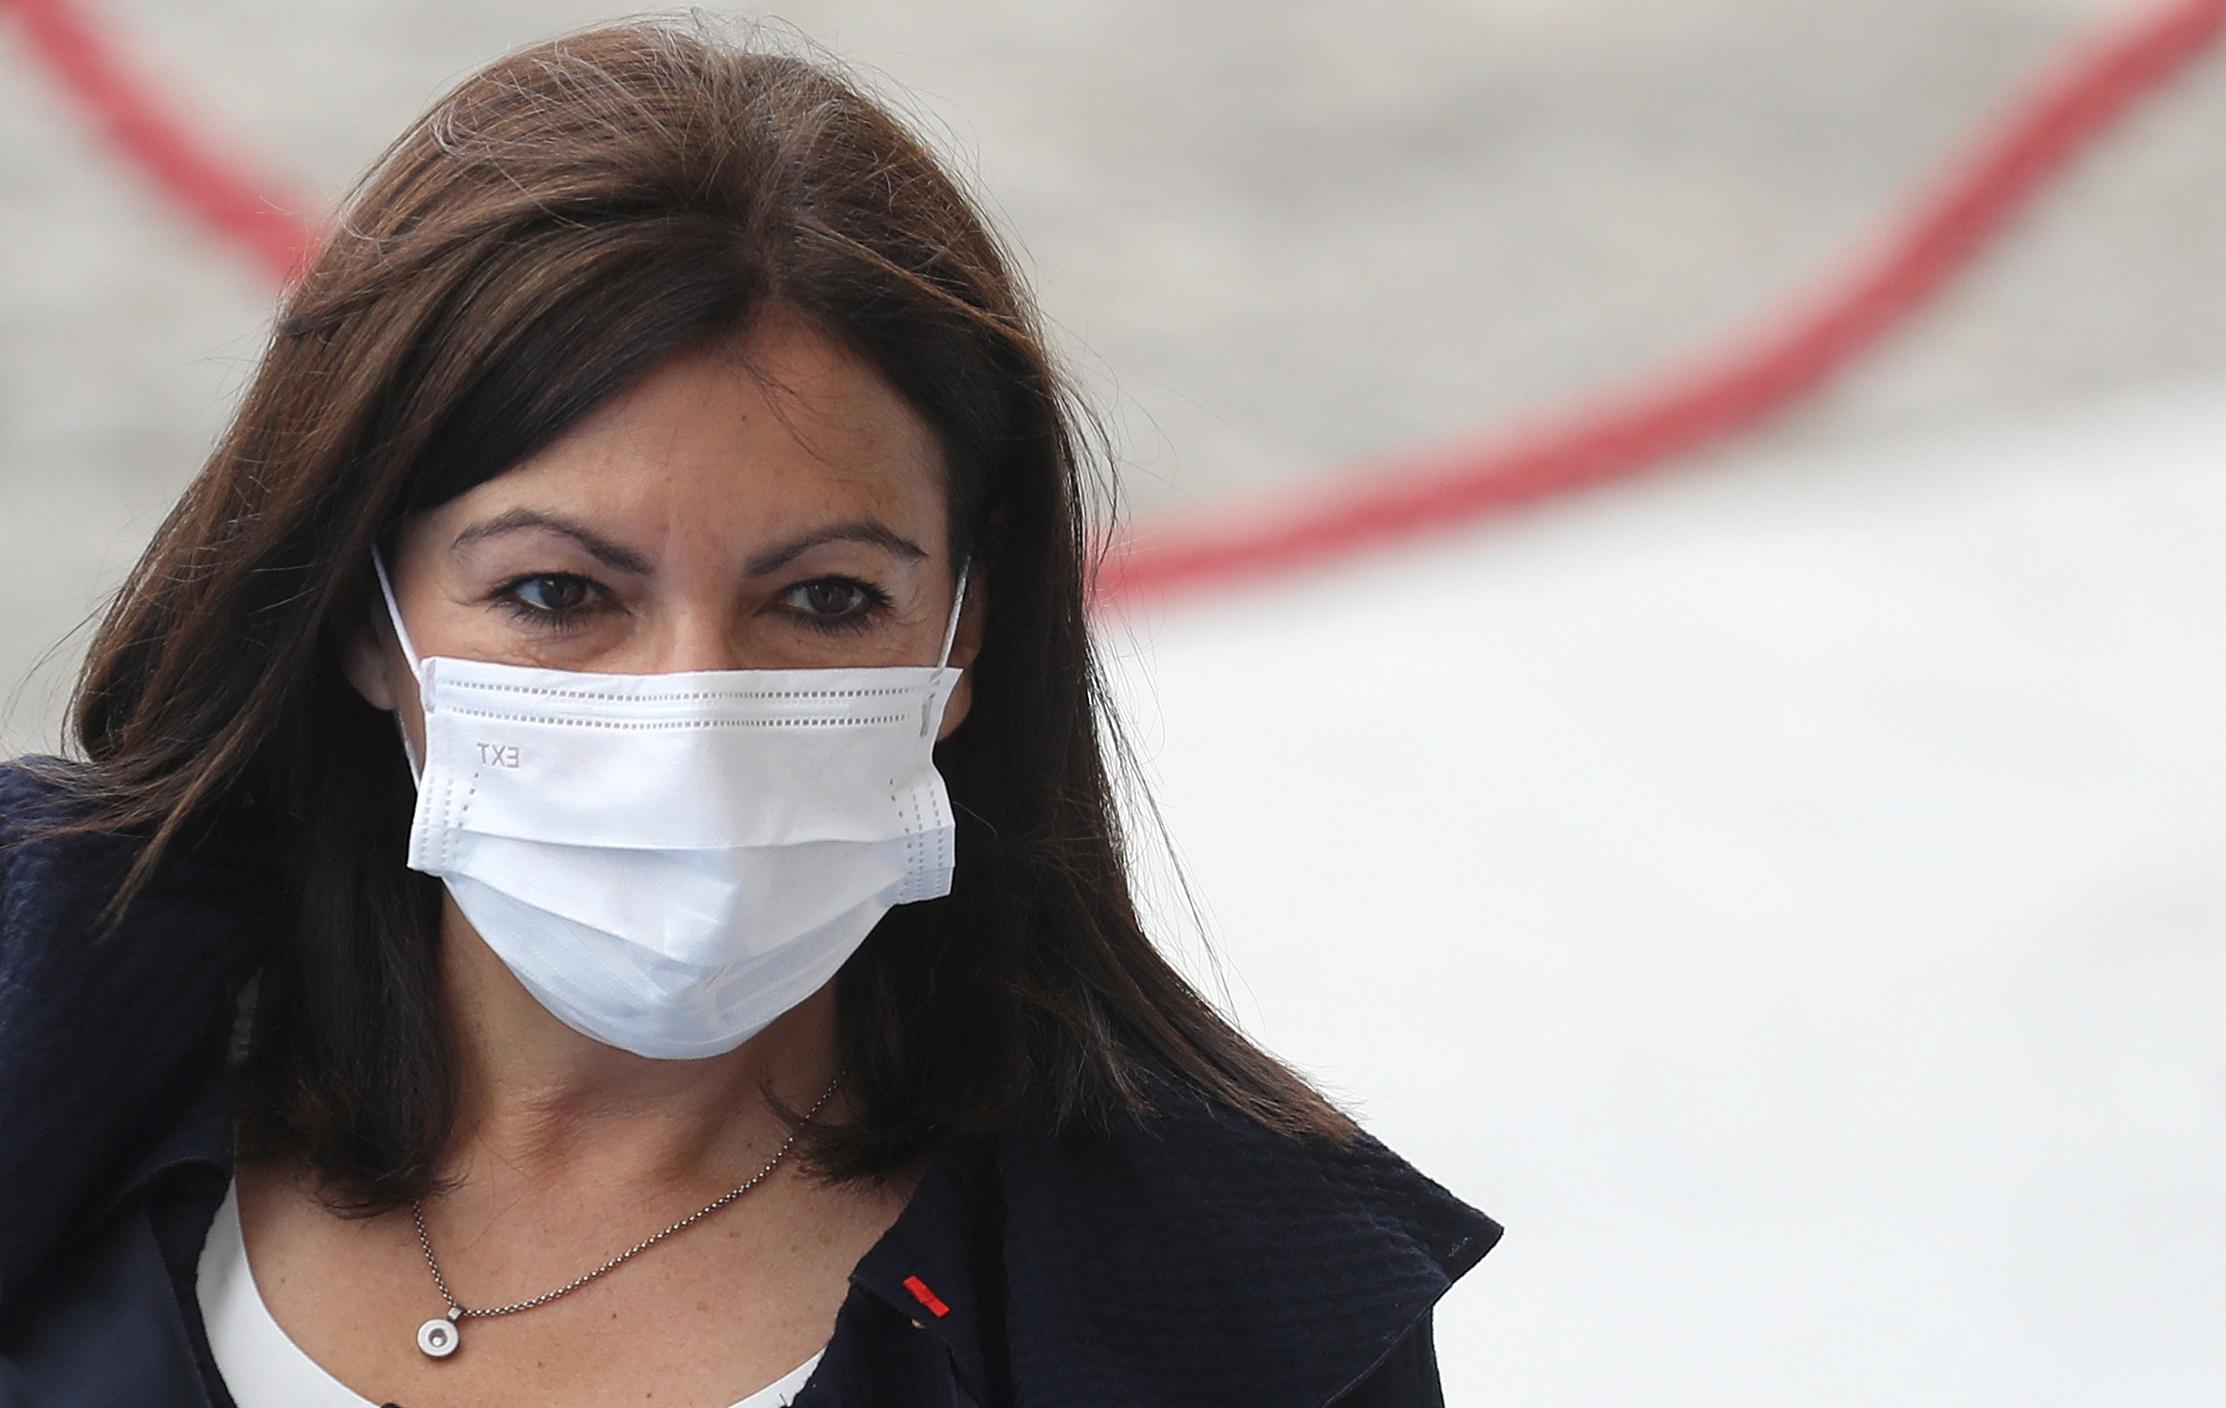 Coronavirus: Hidalgo en désaccord avec les mesures de restriction